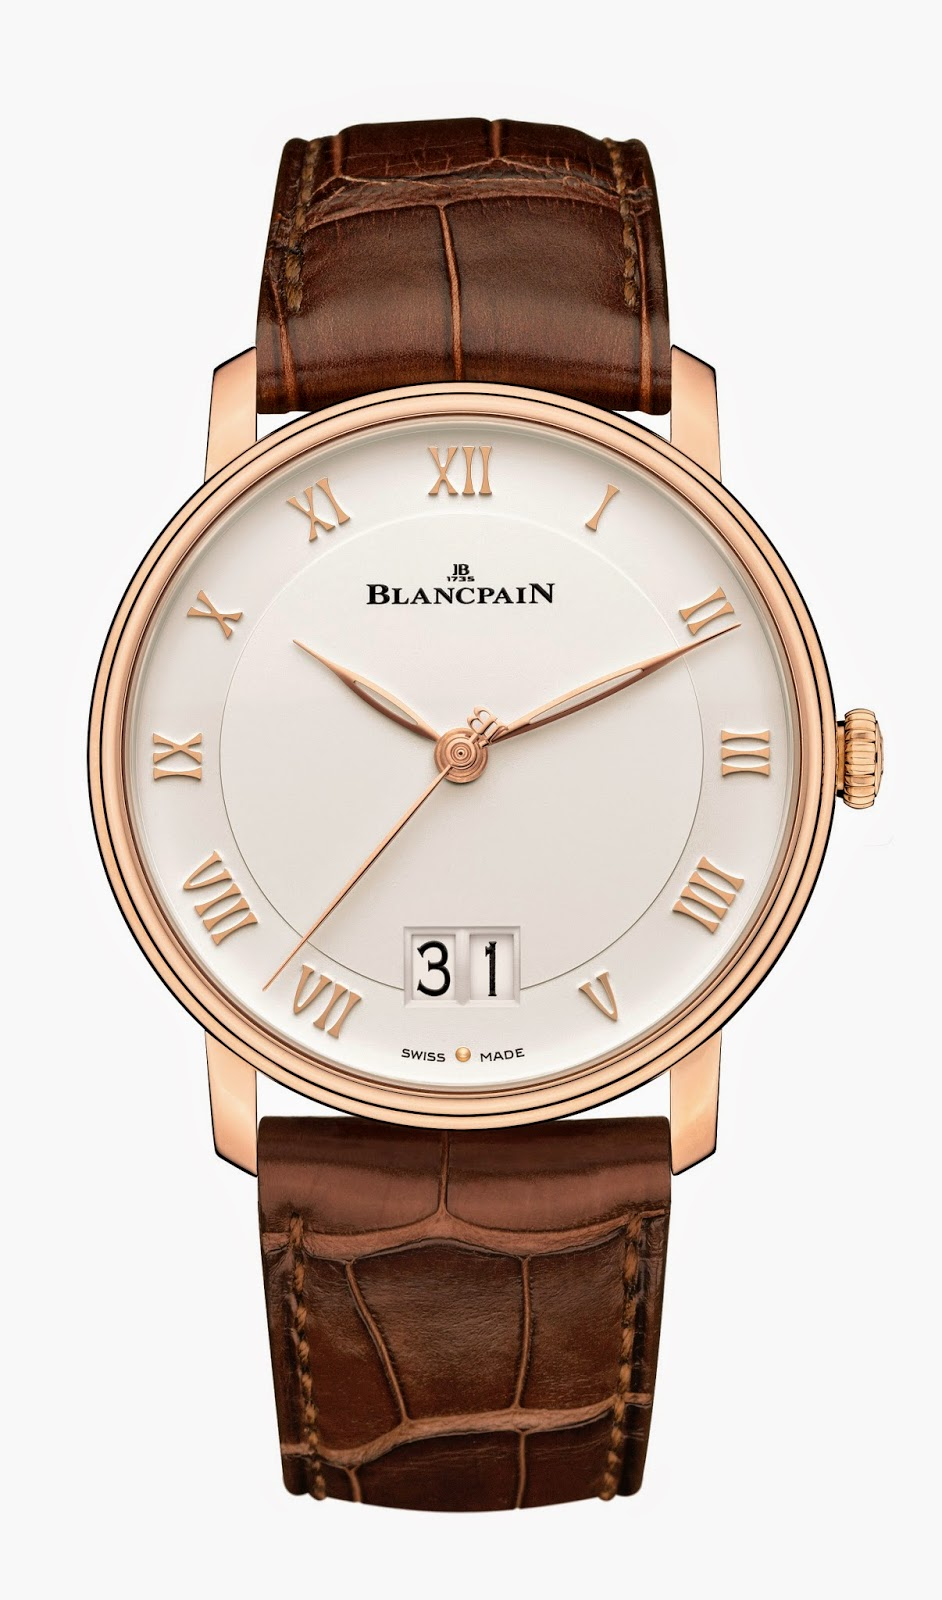 Blancpain Pre Basel 2015 debajodelreloj2